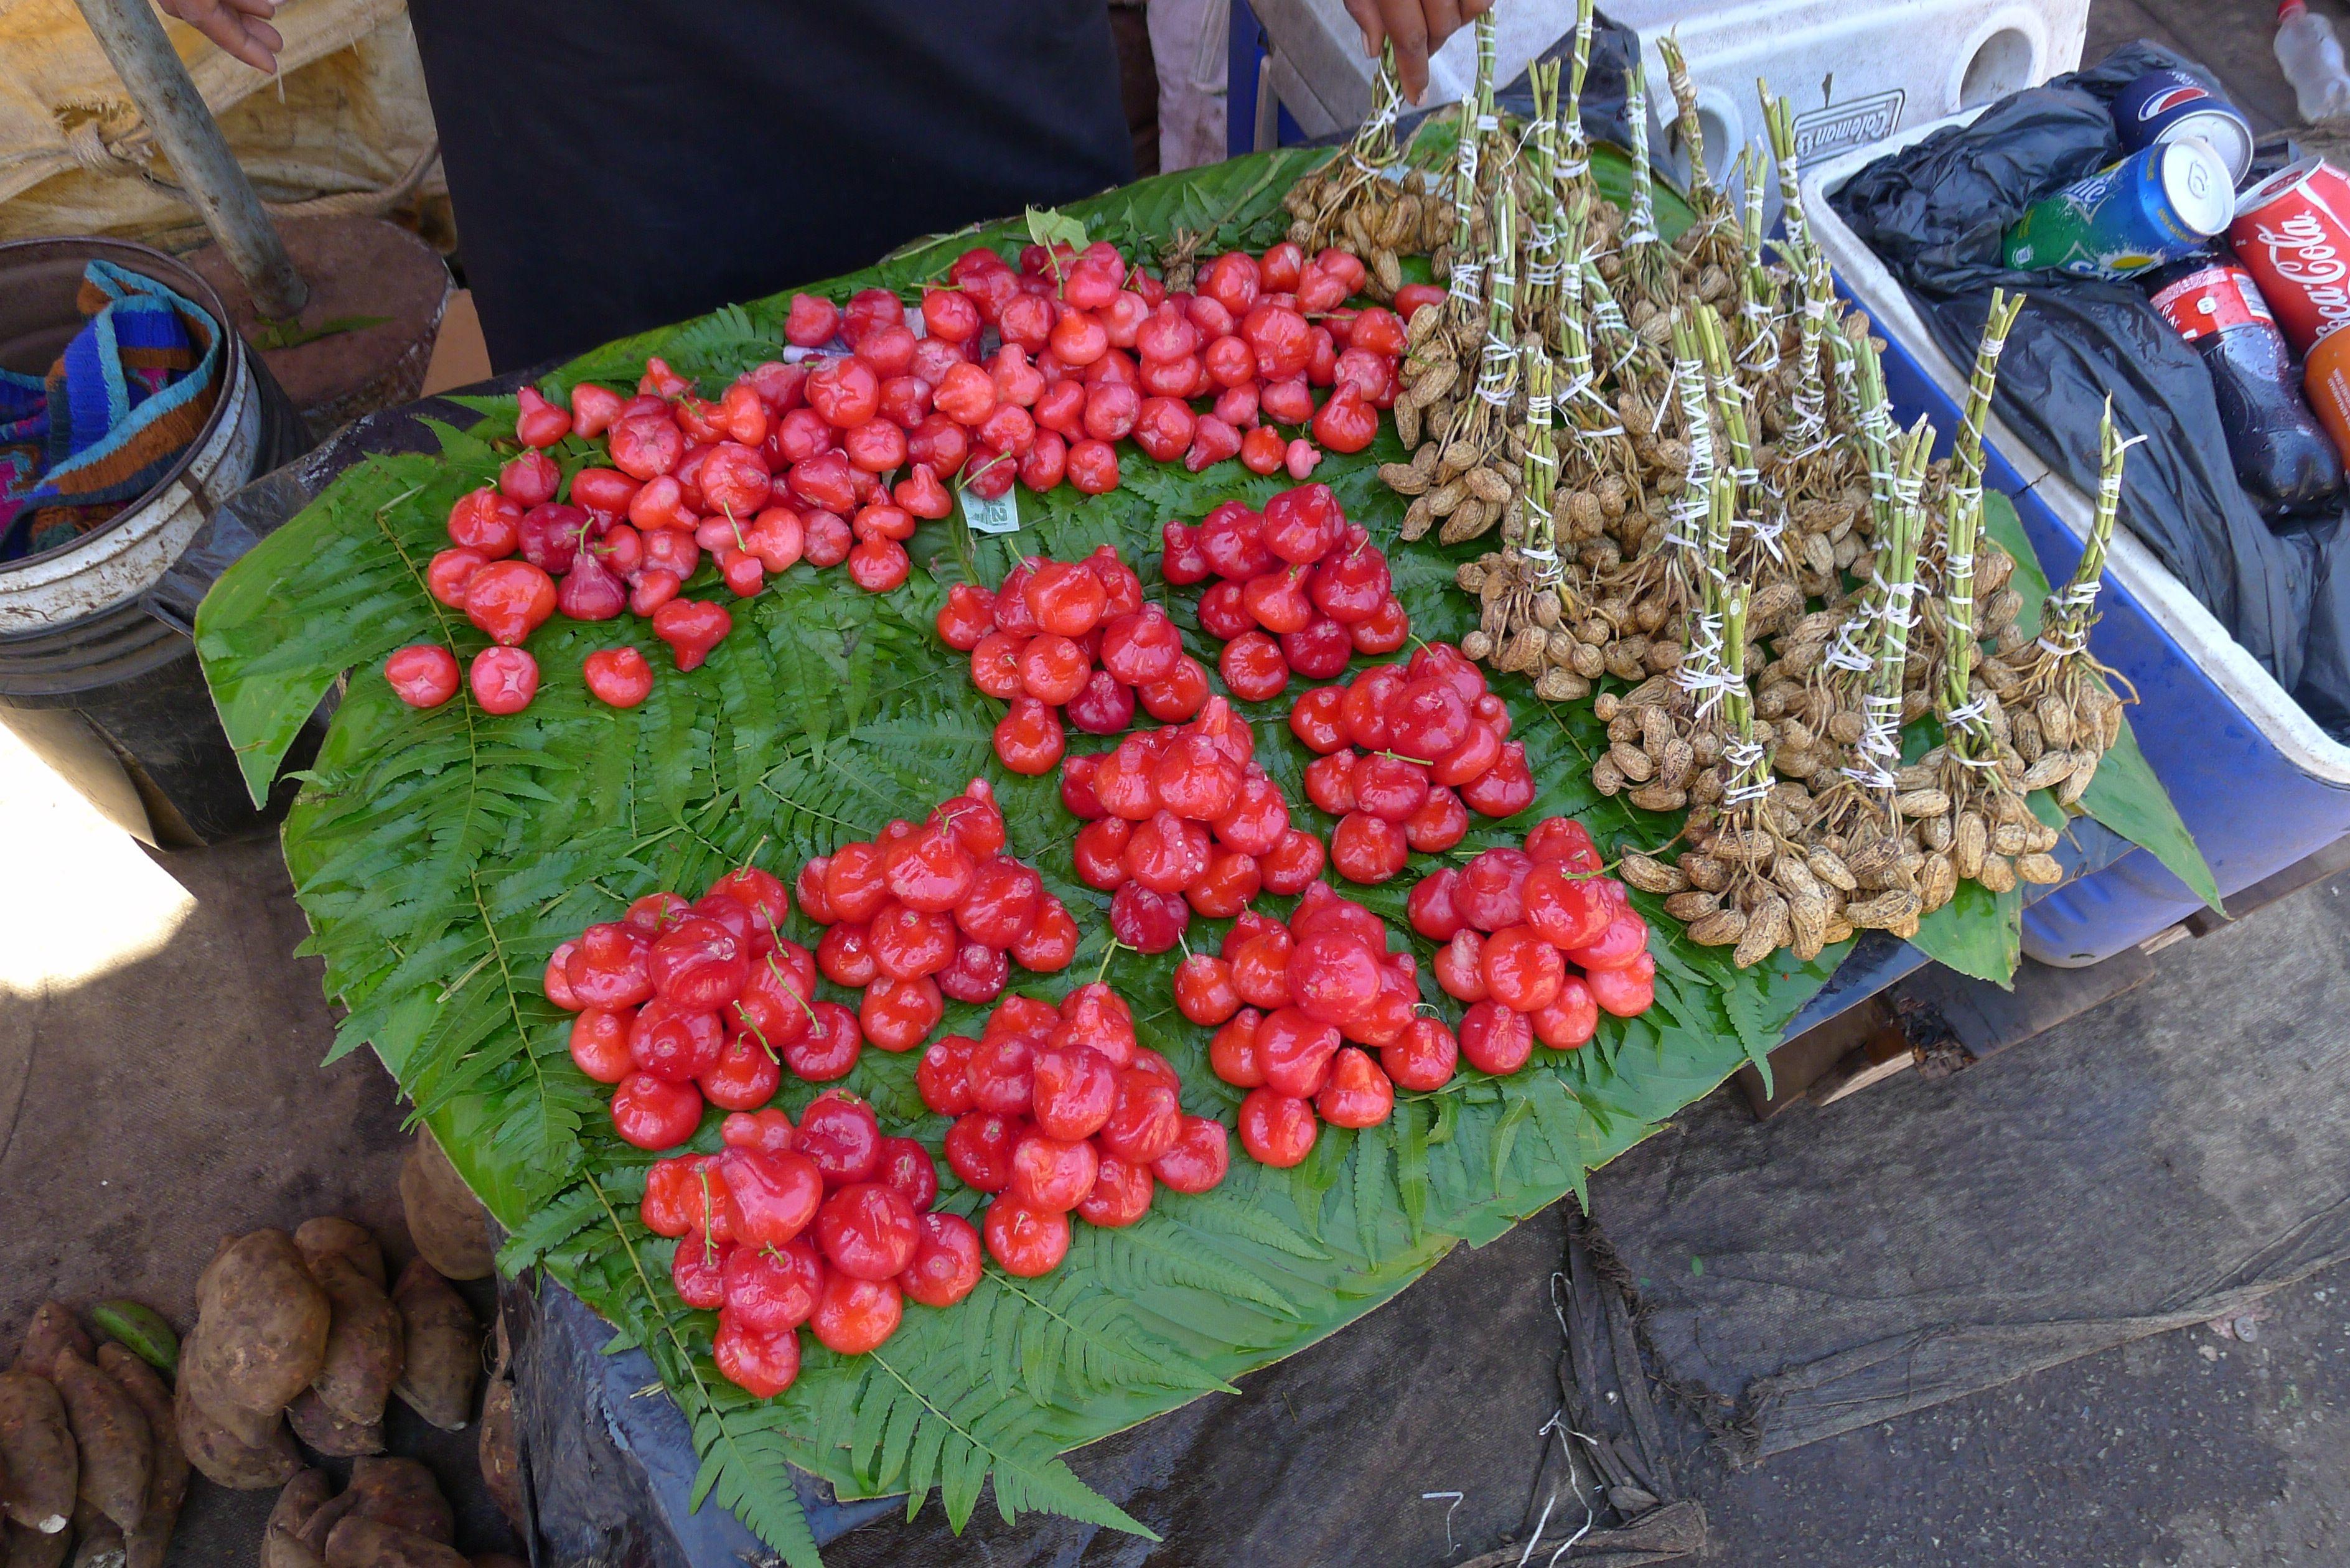 Laulau Syzygium Aqueum Peanuts Manu Market Jerry Coleby Williams